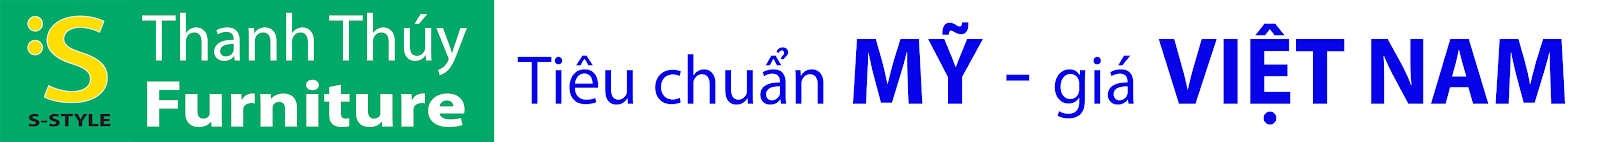 Thanh Thúy furniture